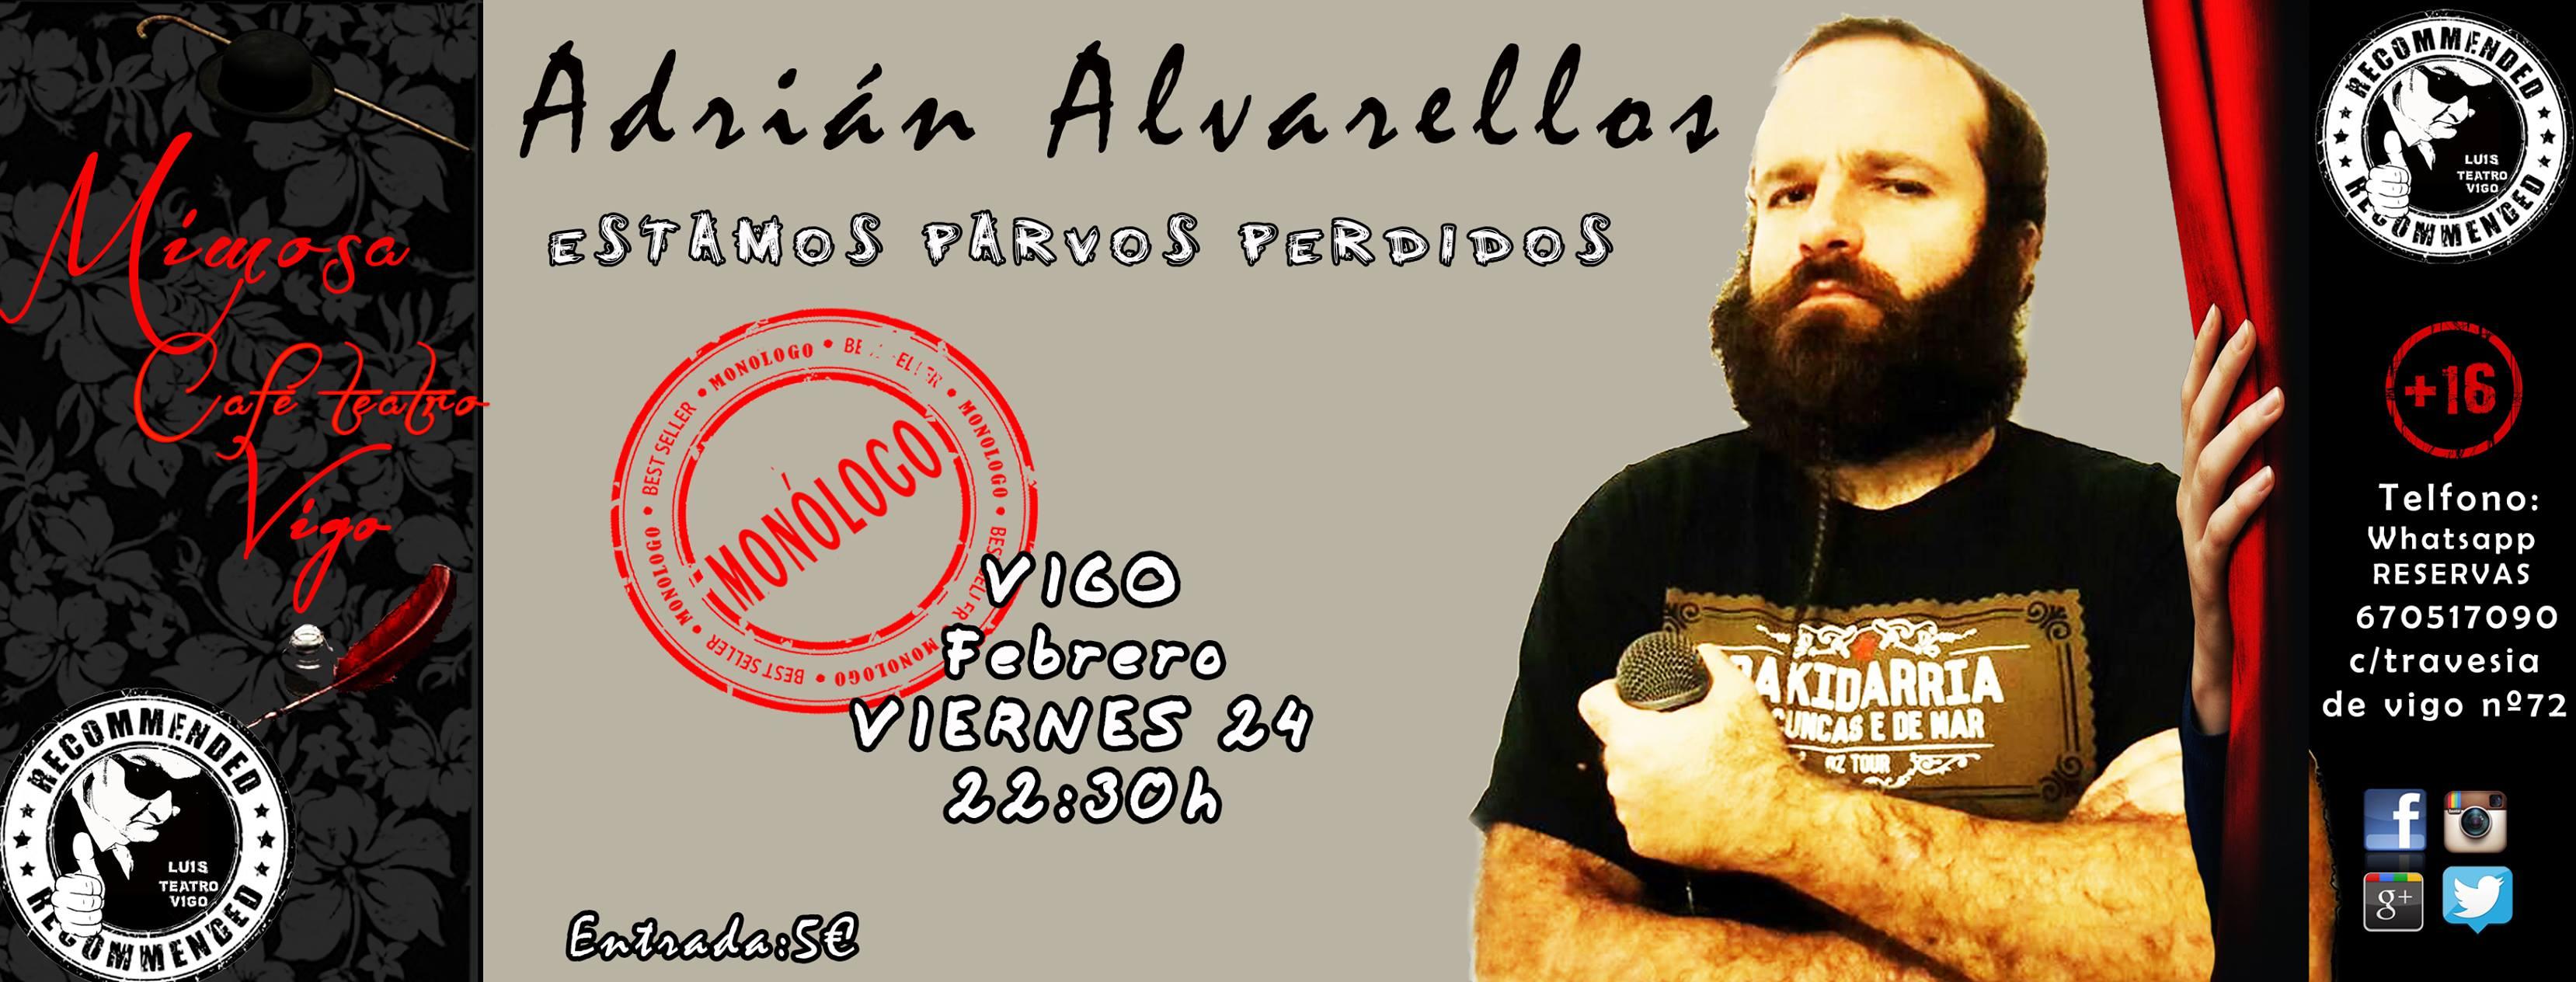 Monólogo de Adrián Alvarellos